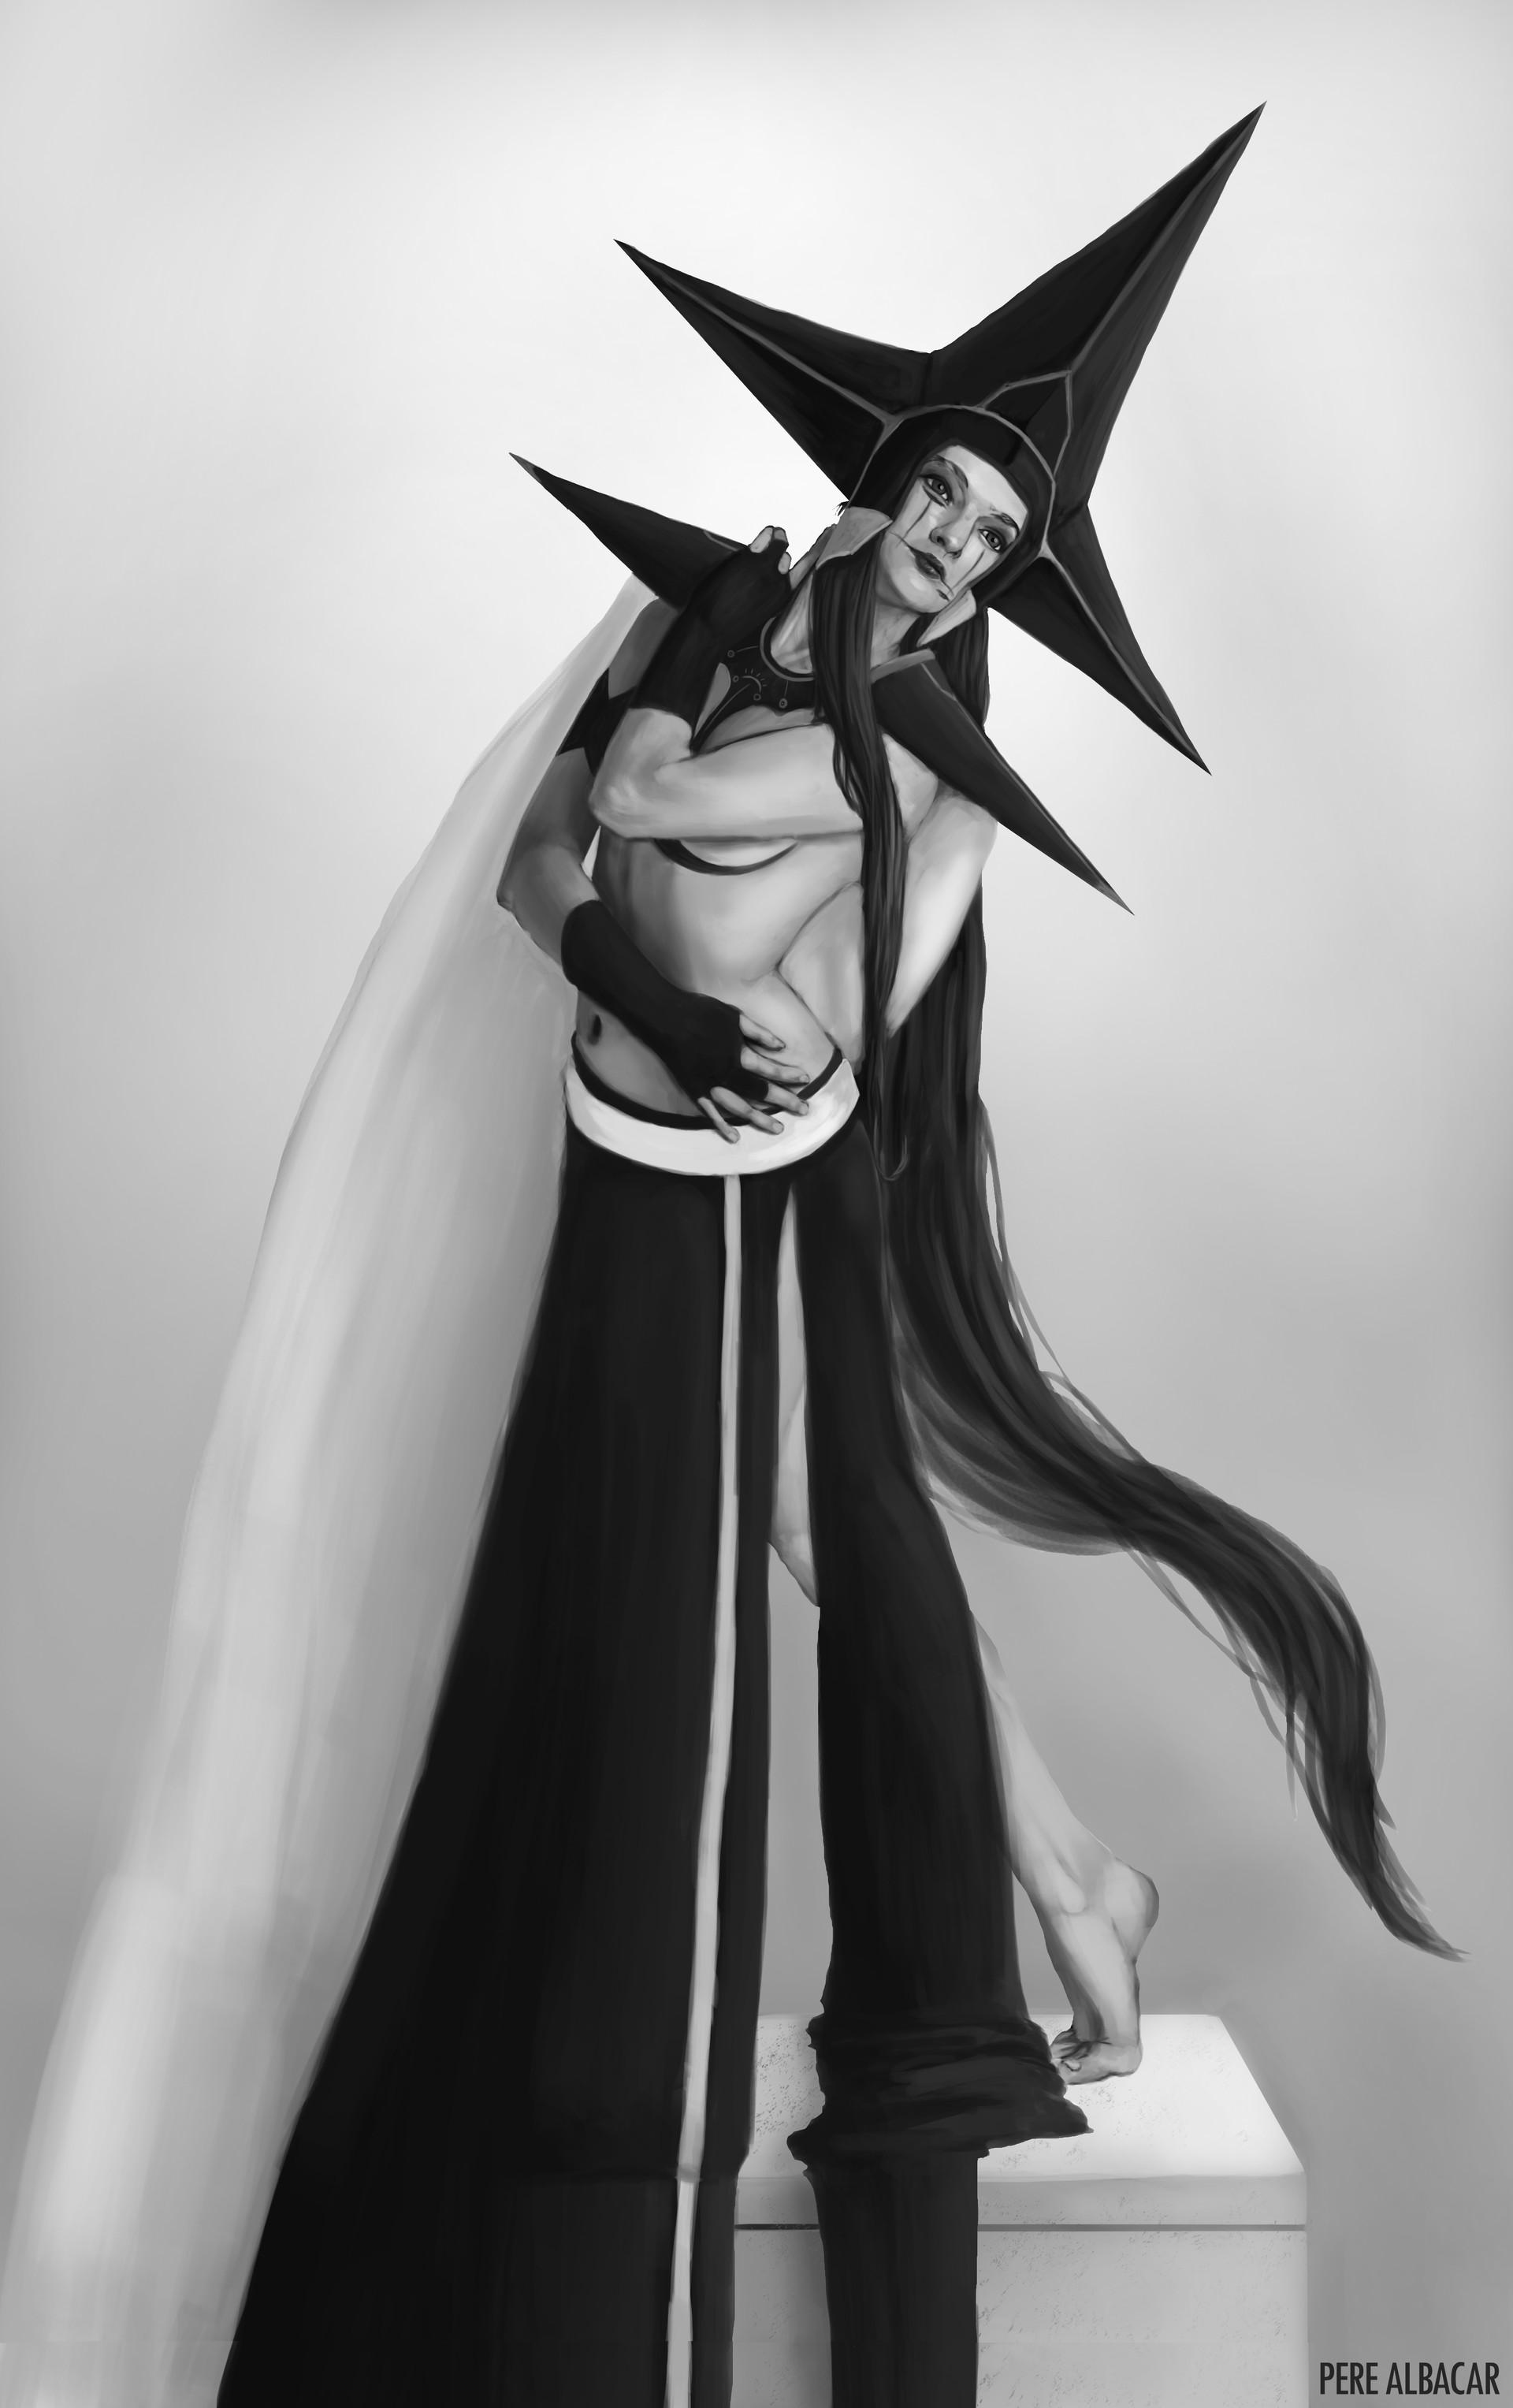 Pere albacar roda dark queen